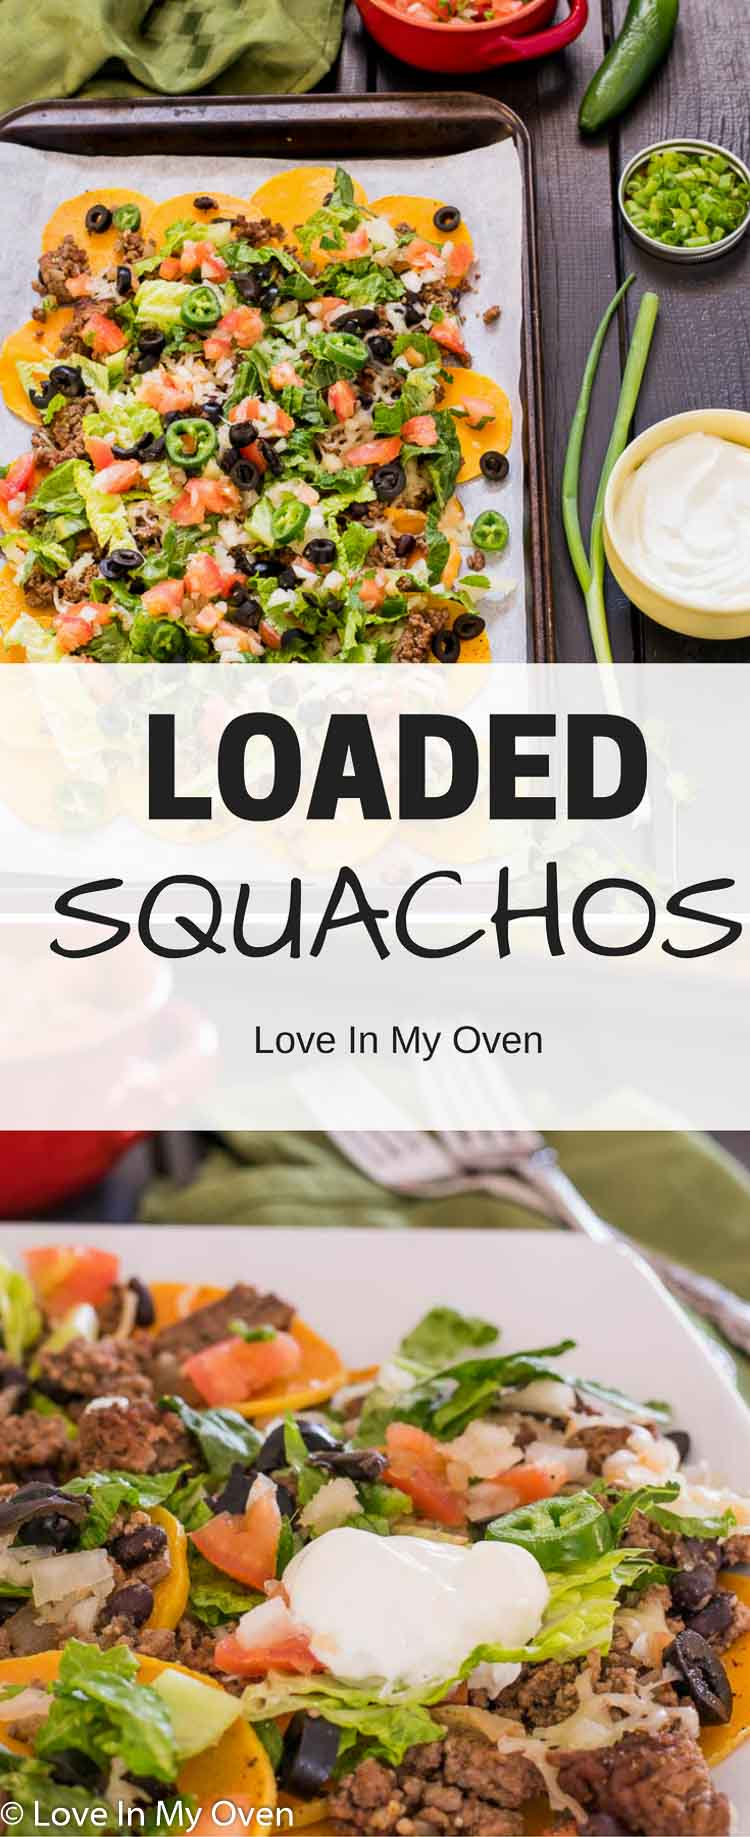 loaded squachos